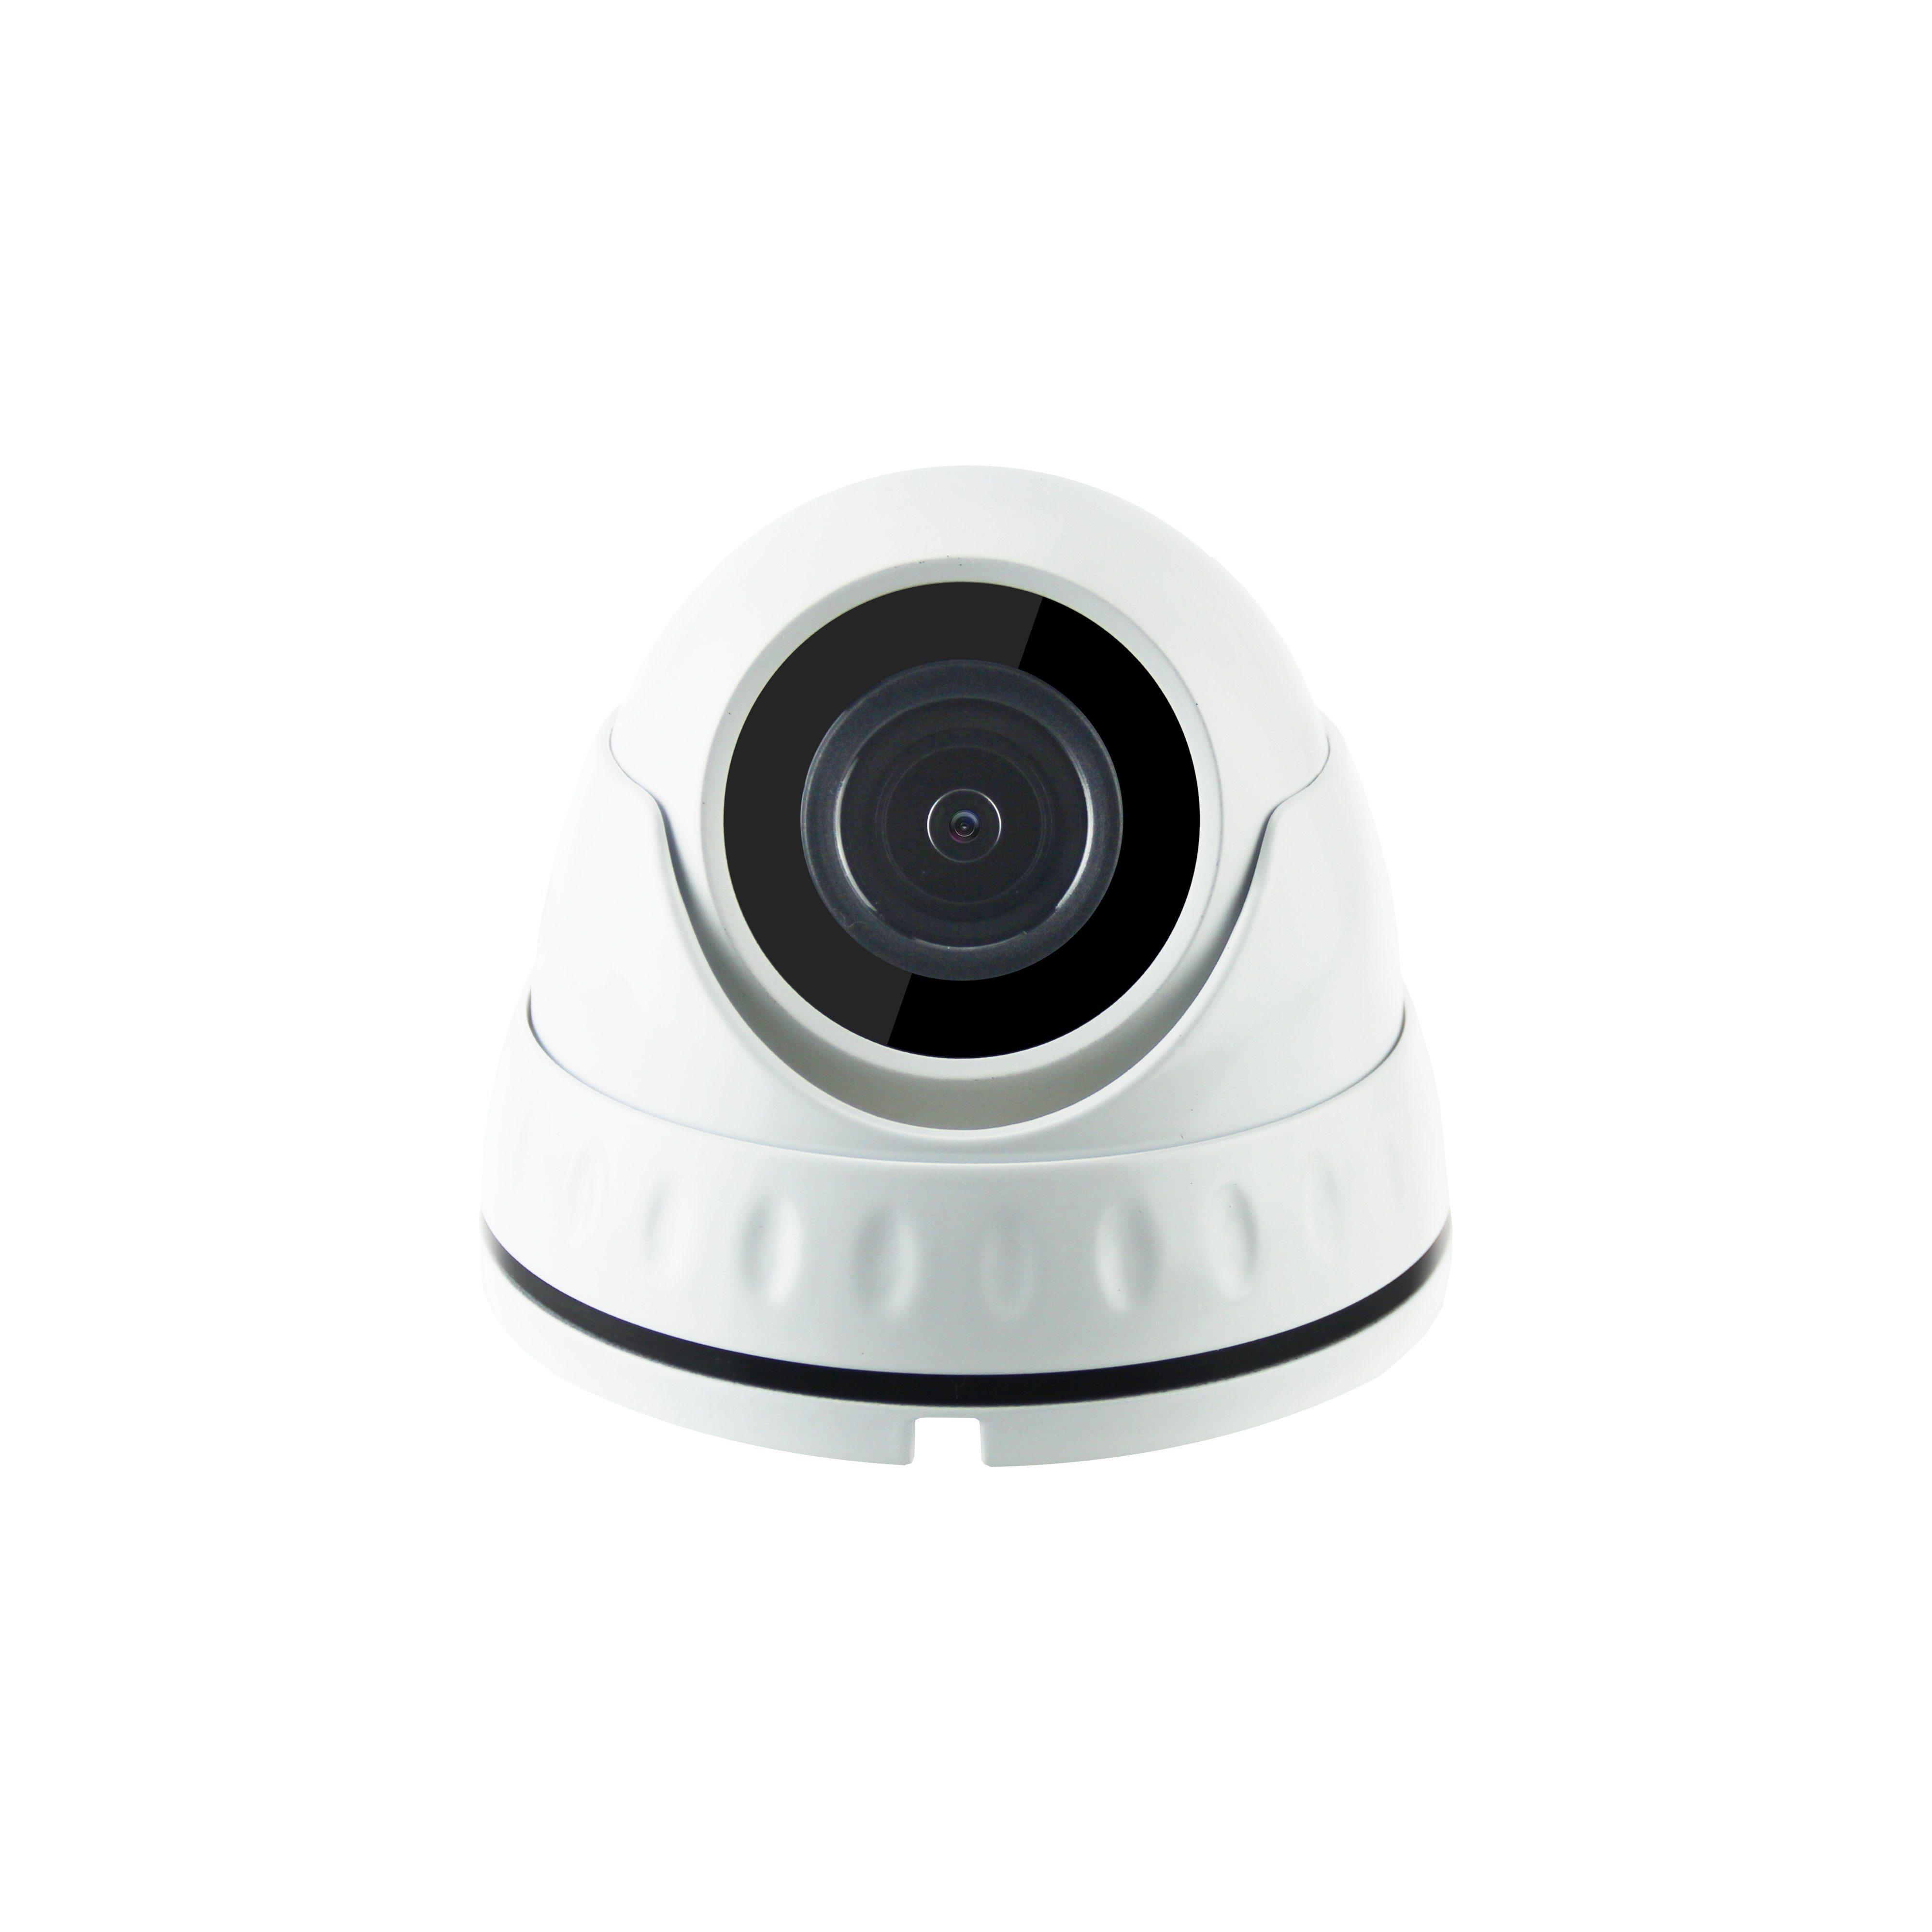 Hot Waterproof Dome Sony Sensor IP Camera (SL20)